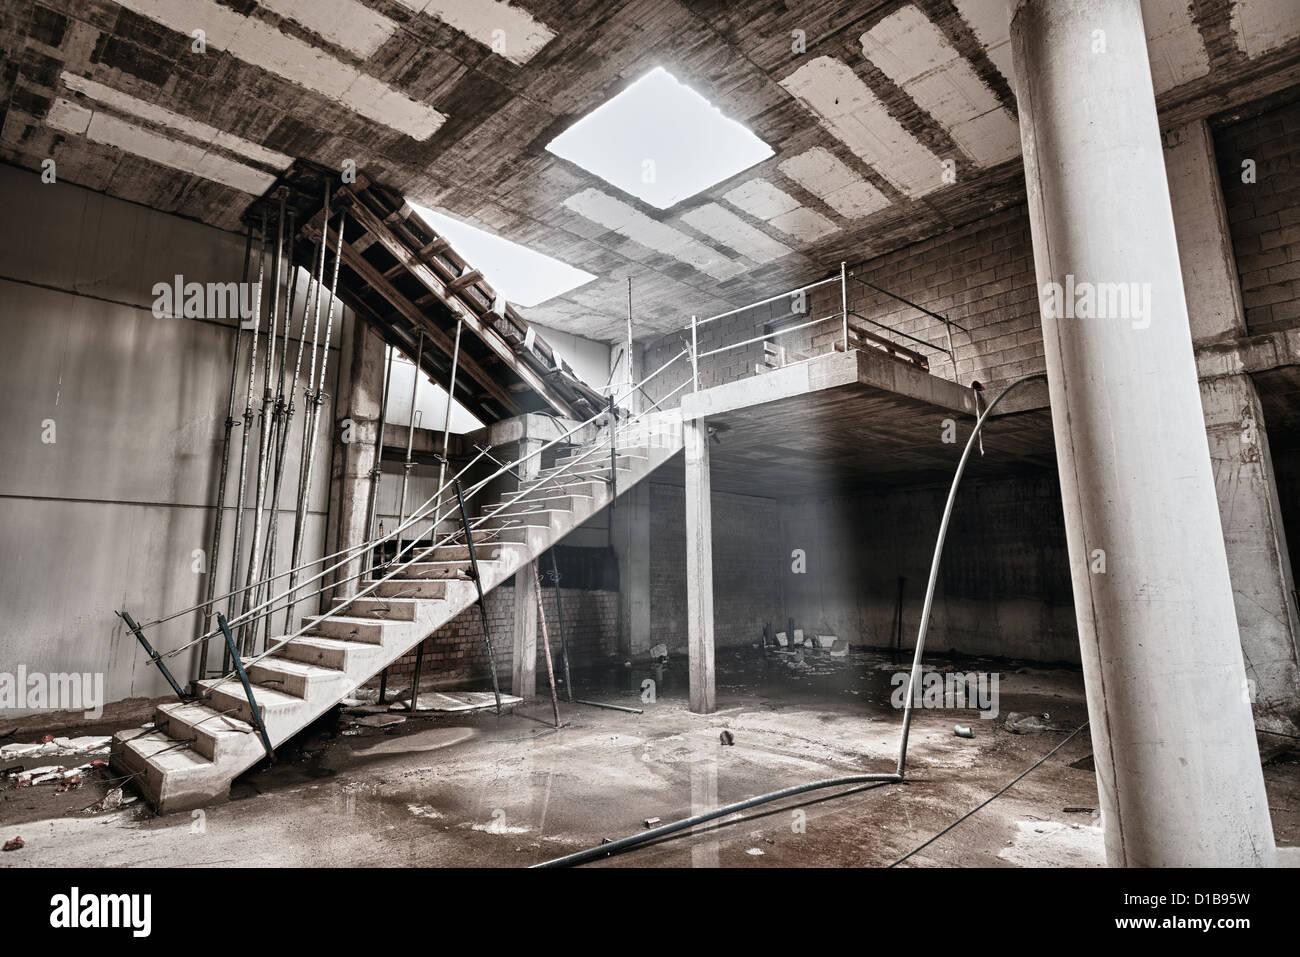 Abandoned building. - Stock Image